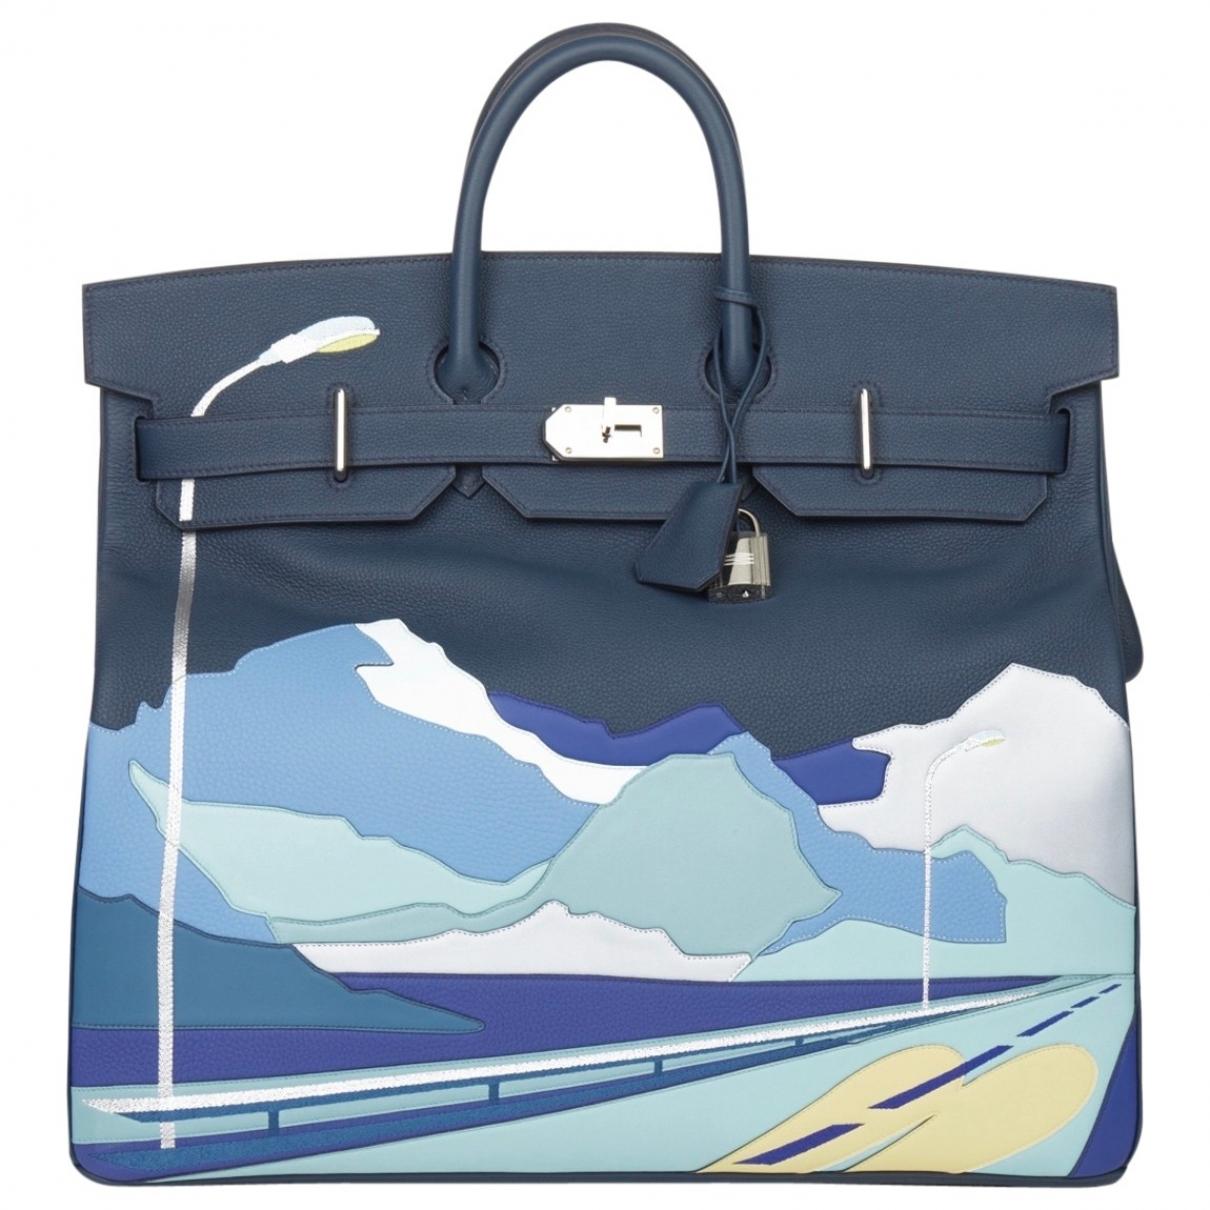 Hermes Haut a Courroies Taschen in  Blau Leder